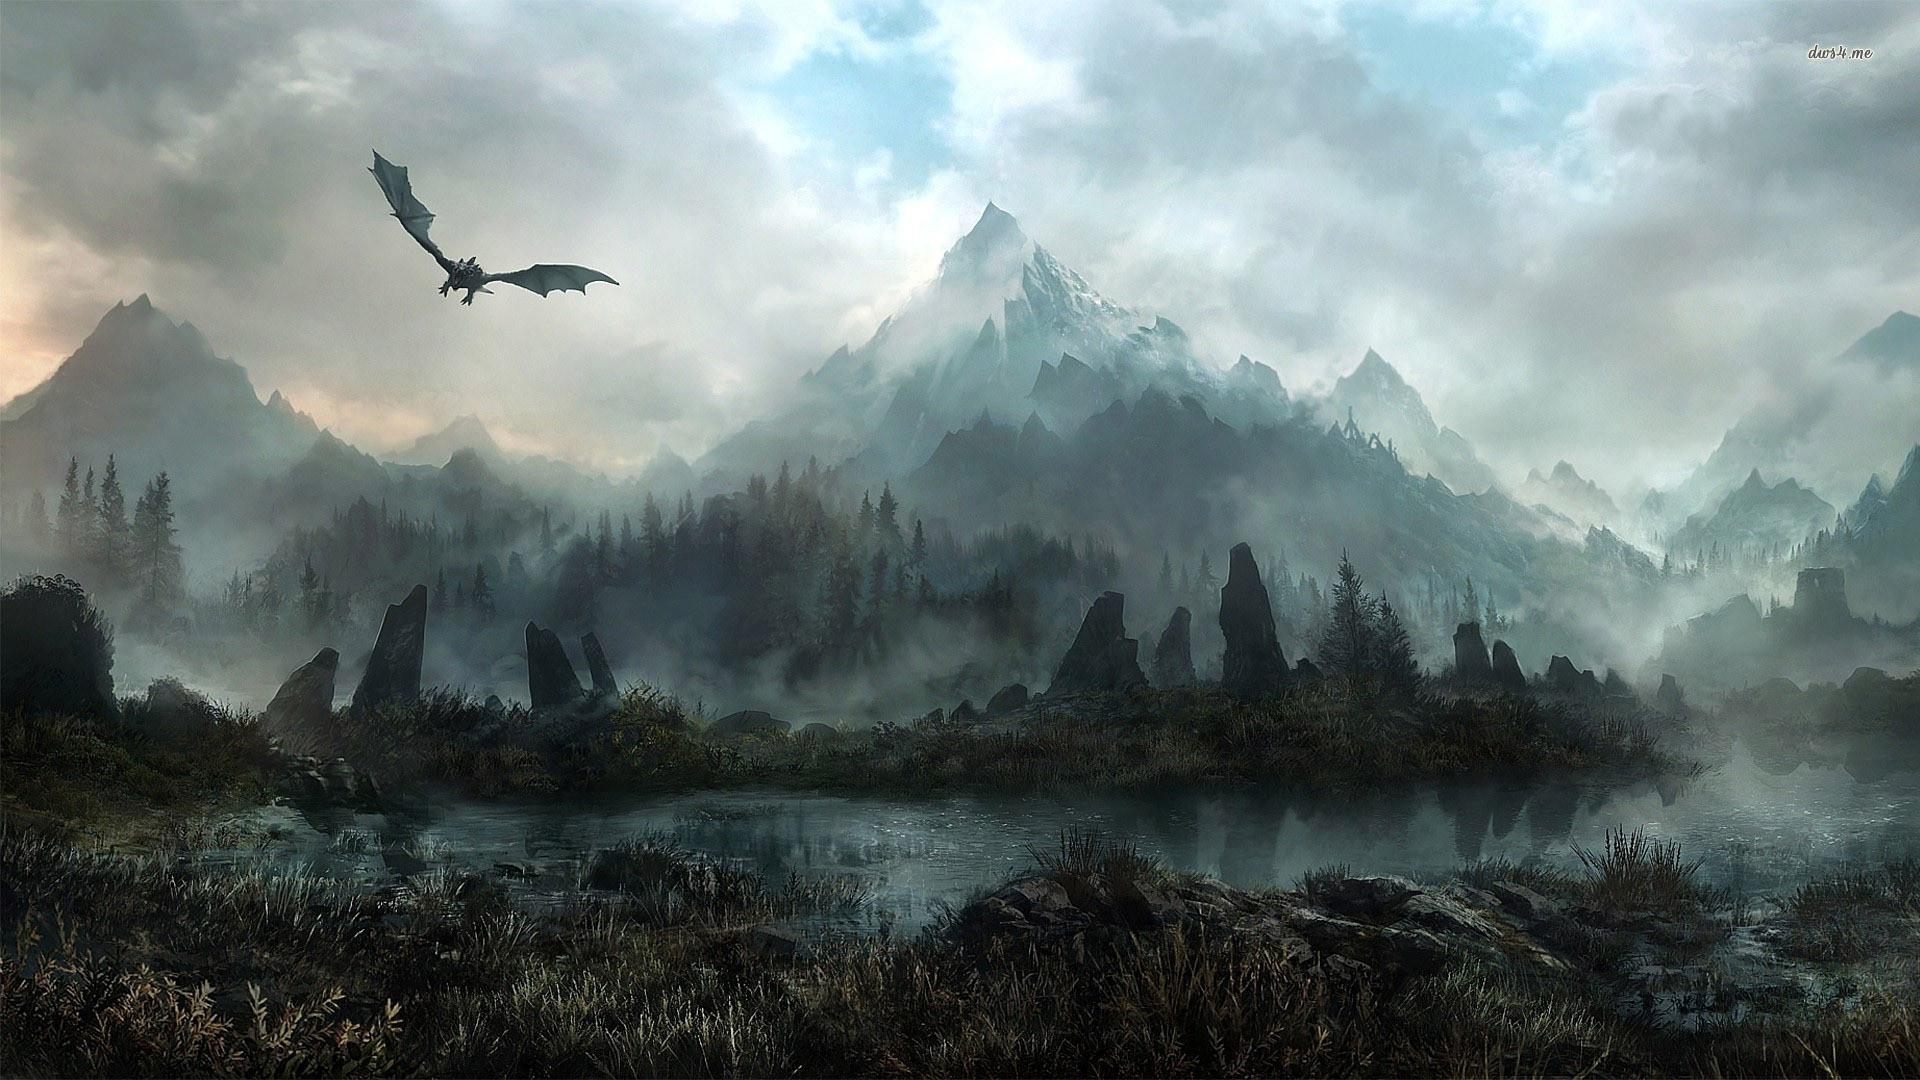 Hd Skyrim Wallpapers 1080p 78 Images